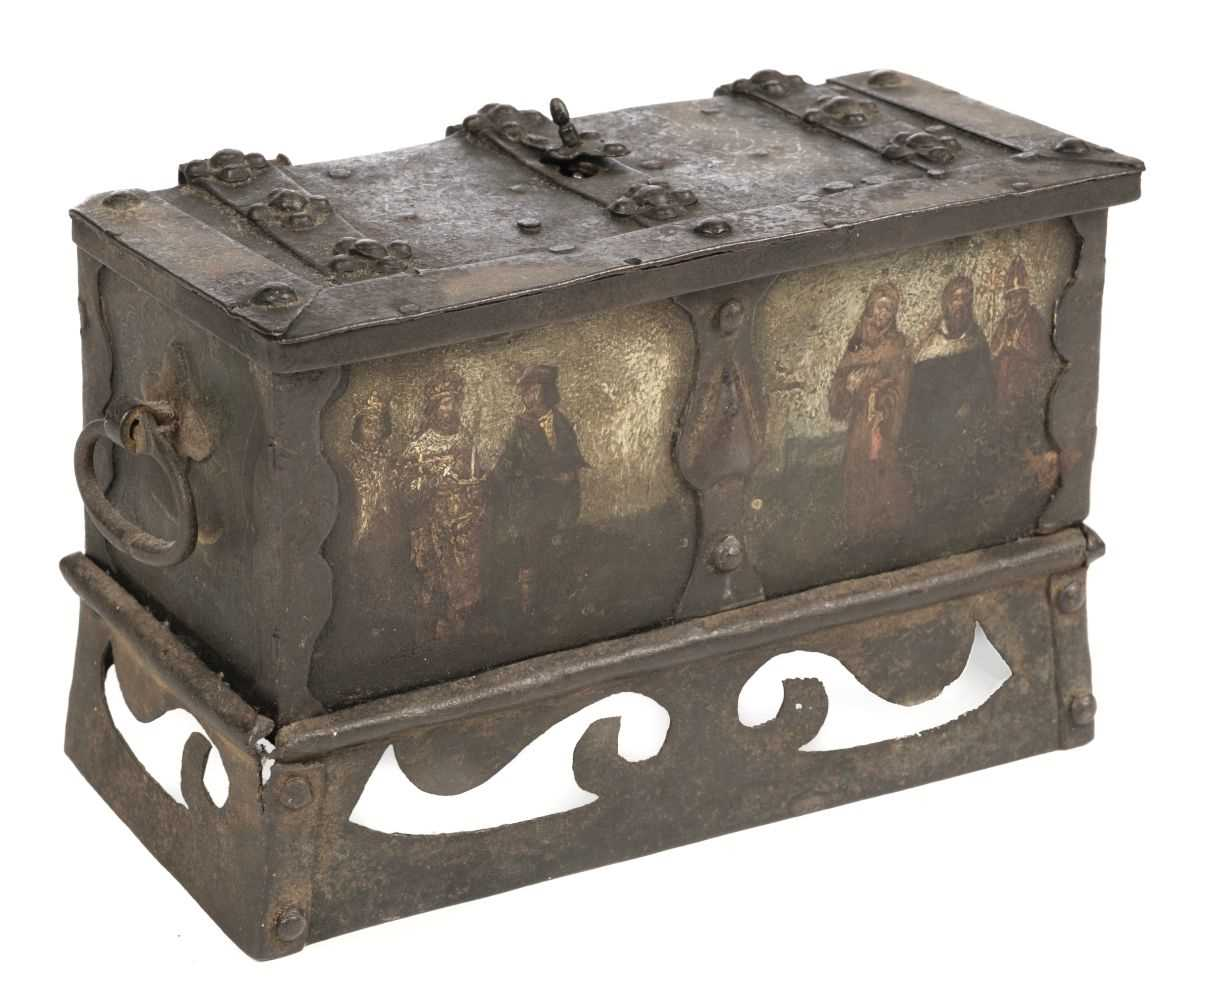 Lot 46 - Casket. German Nuremberg casket, probably 17th century